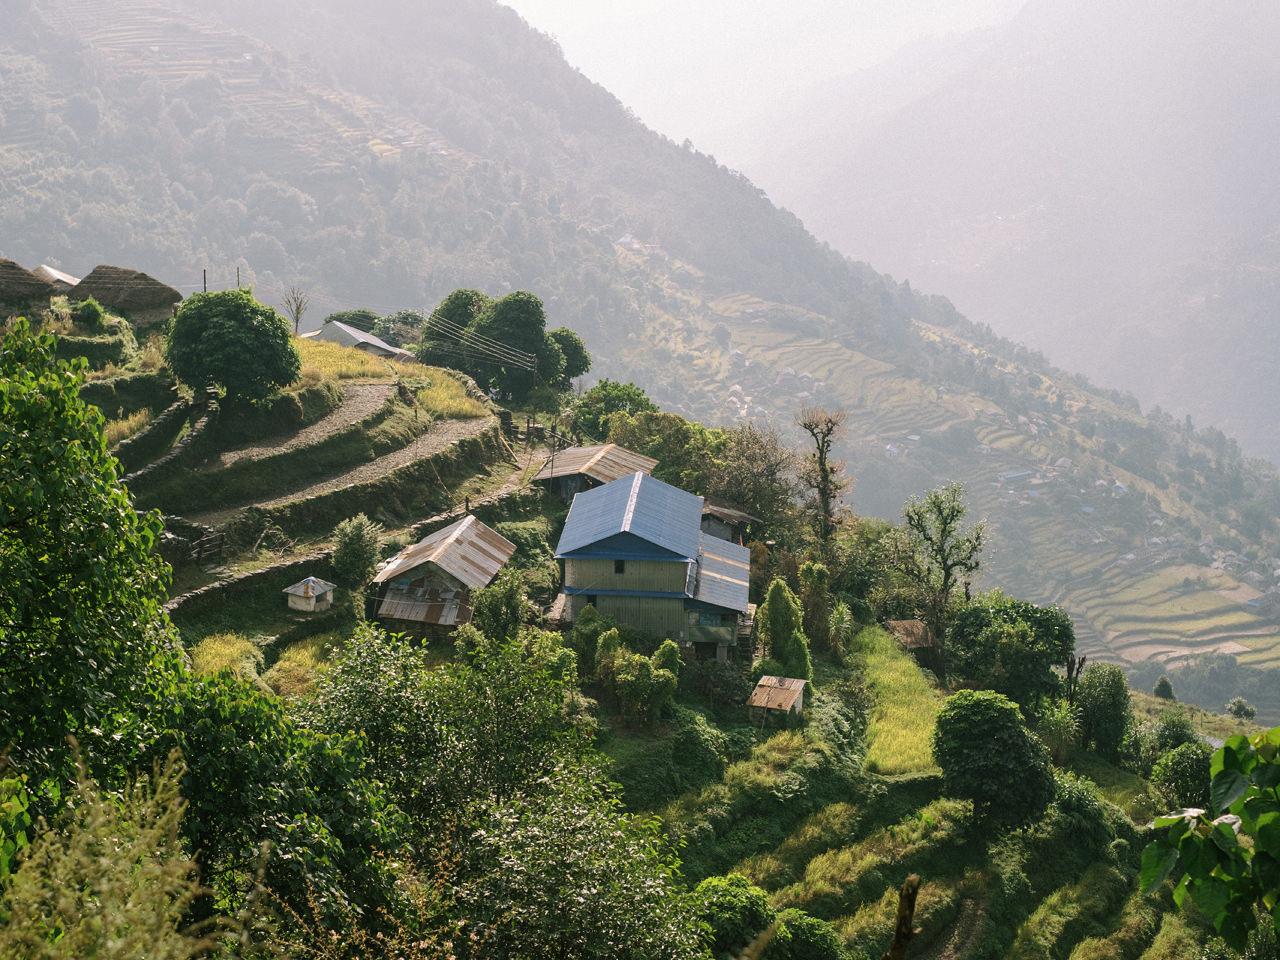 Nepal 2019 - Trekking Annapurna Base Camp 52